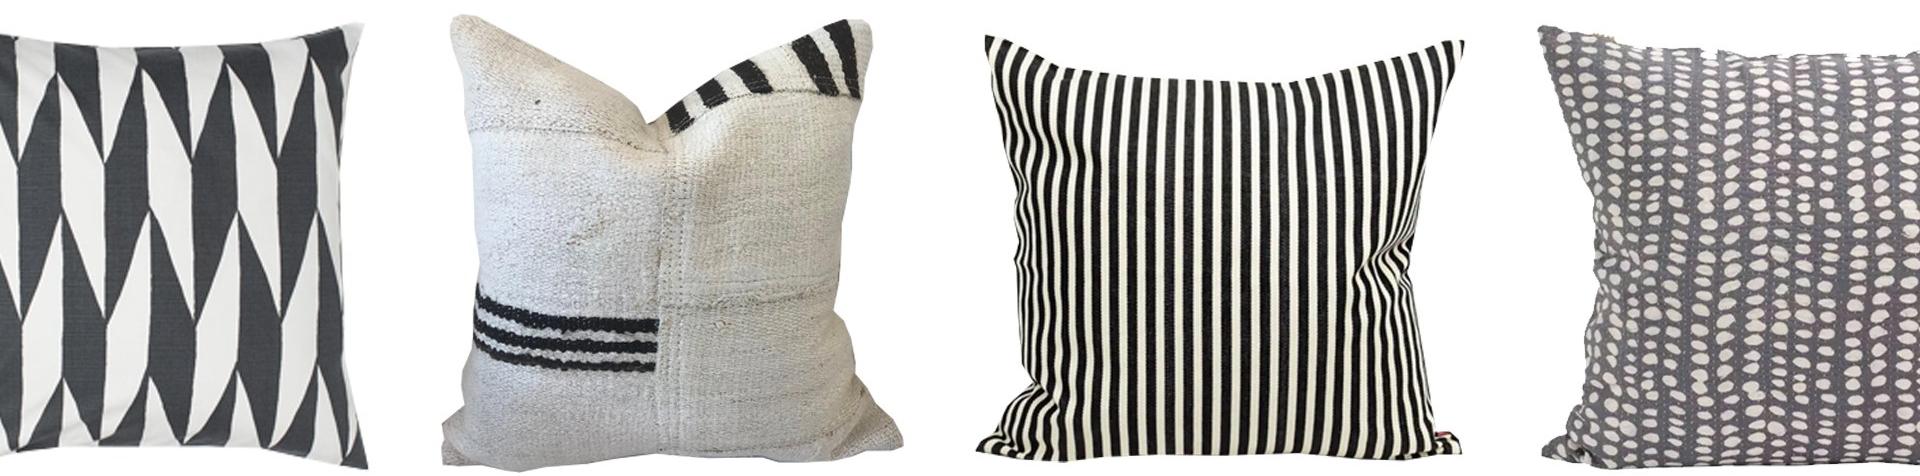 cushions_02